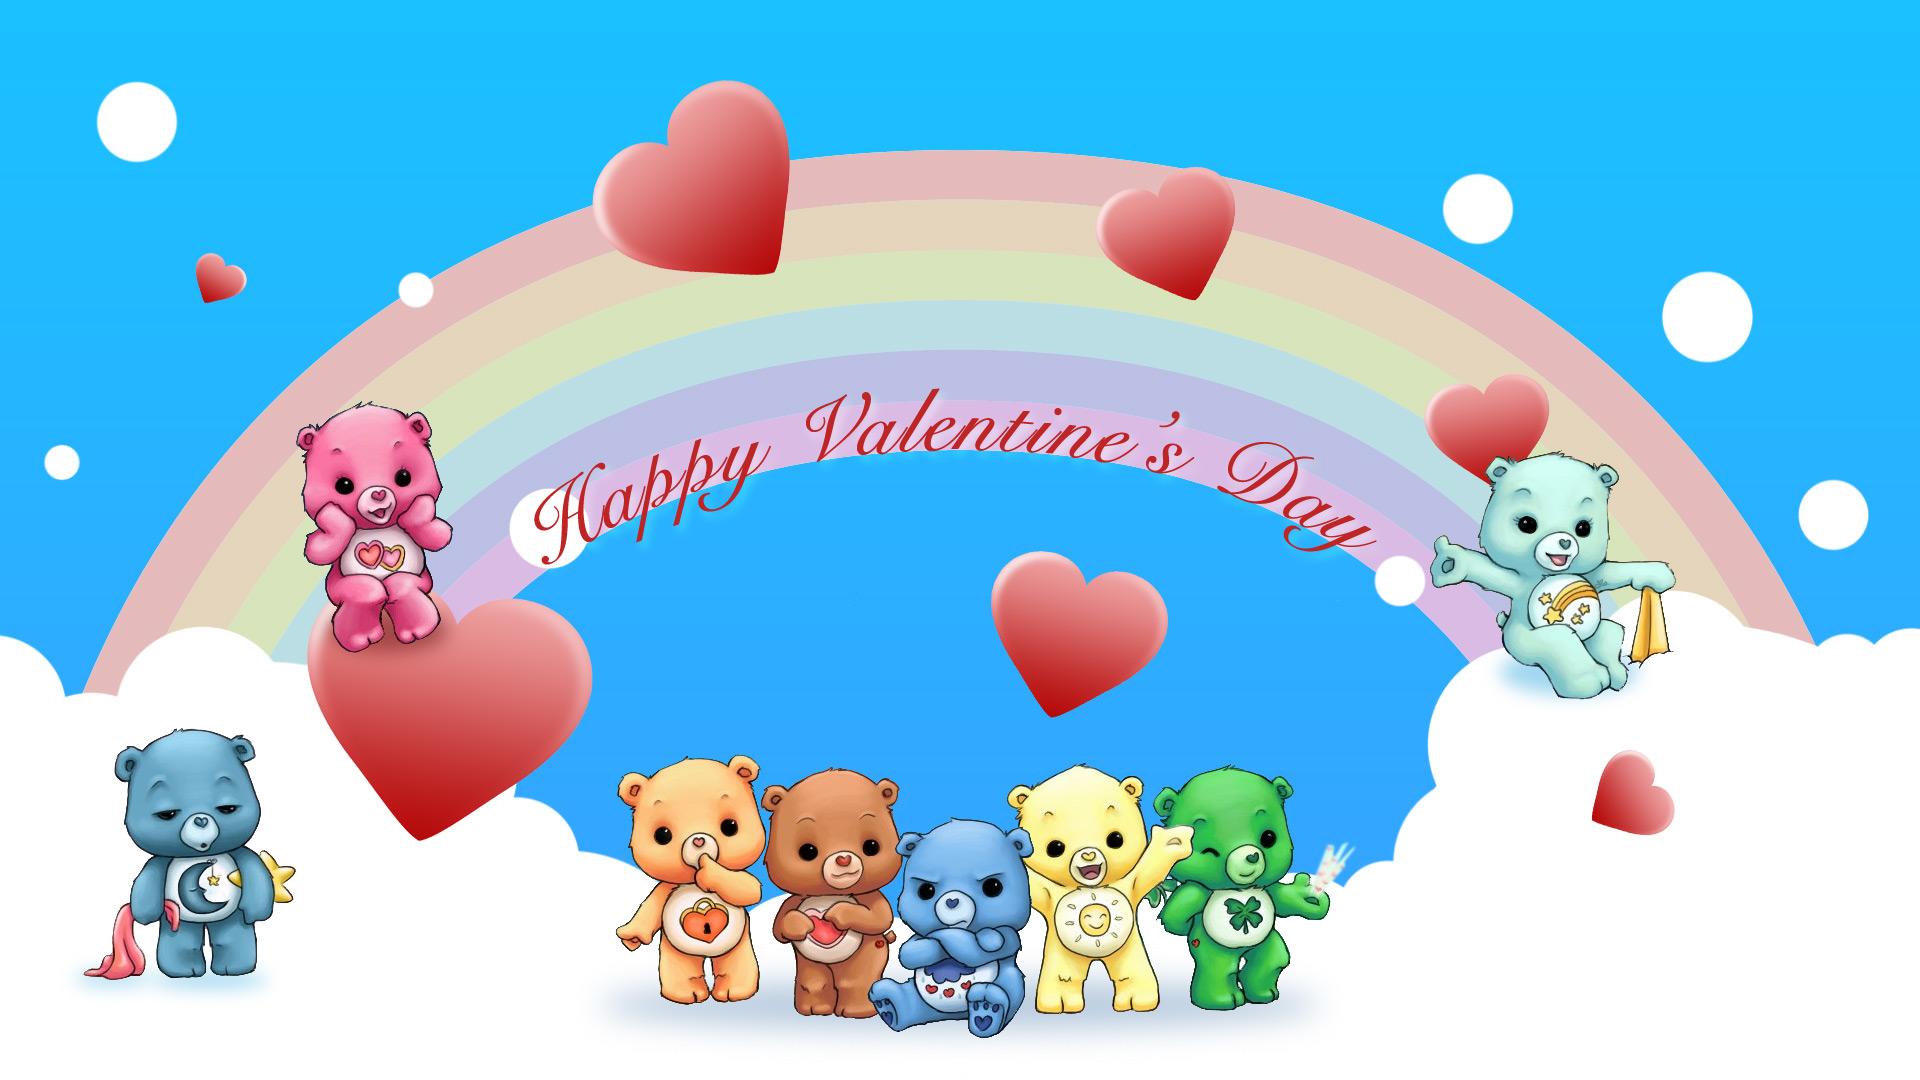 disney valentine wallpaper - HD1920×1080